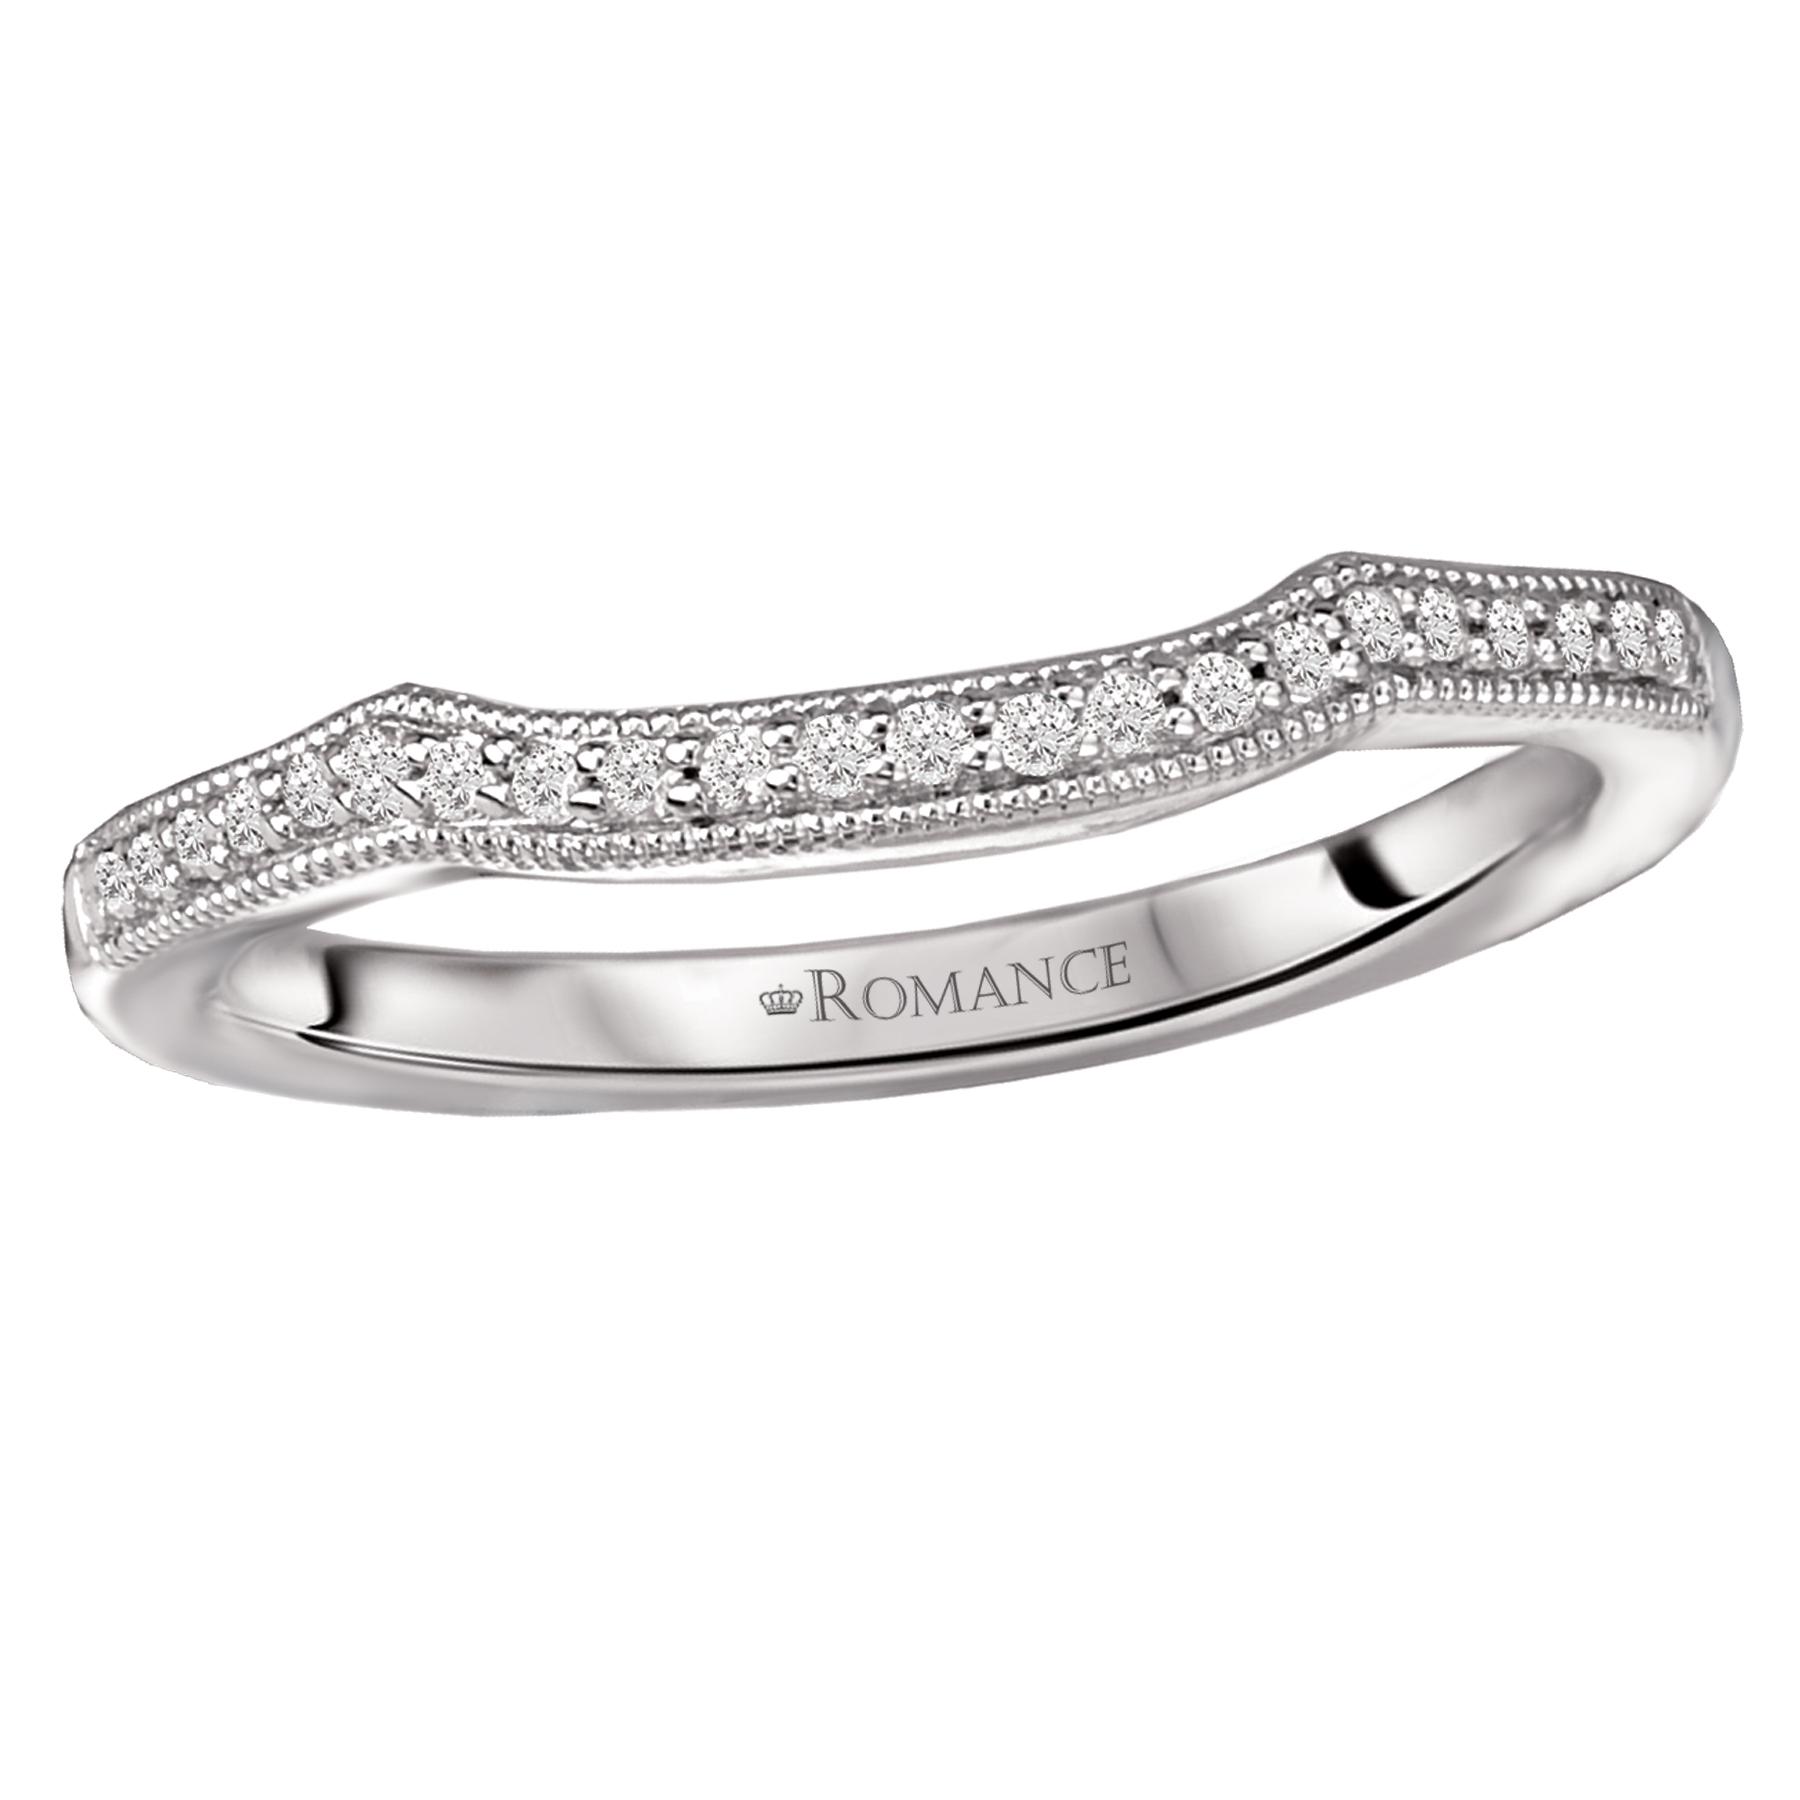 Romance Wedding Bands 117637-100W product image